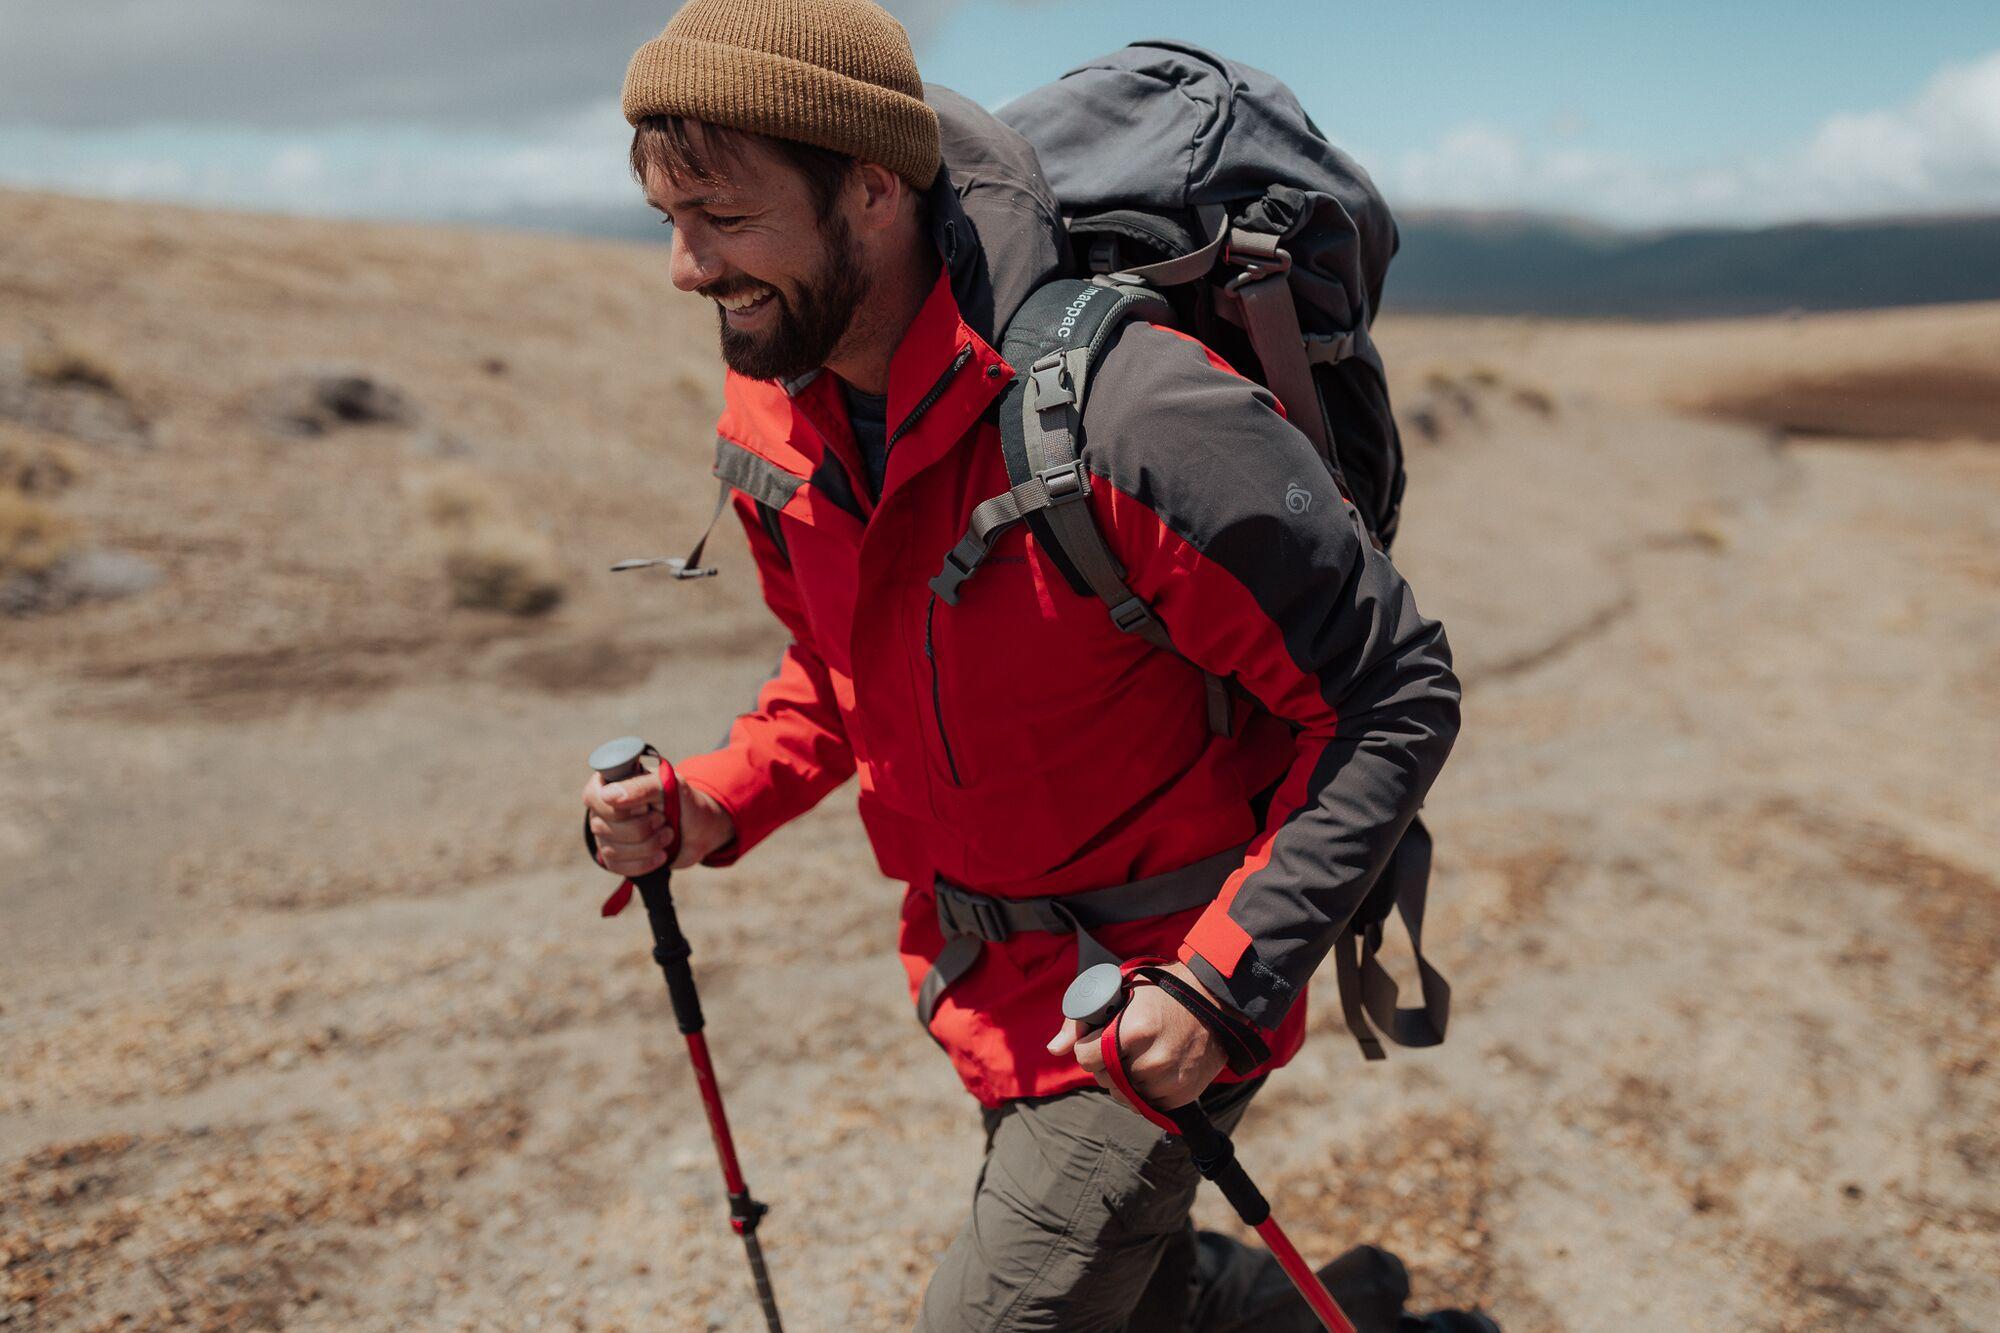 Hiker using walking poles